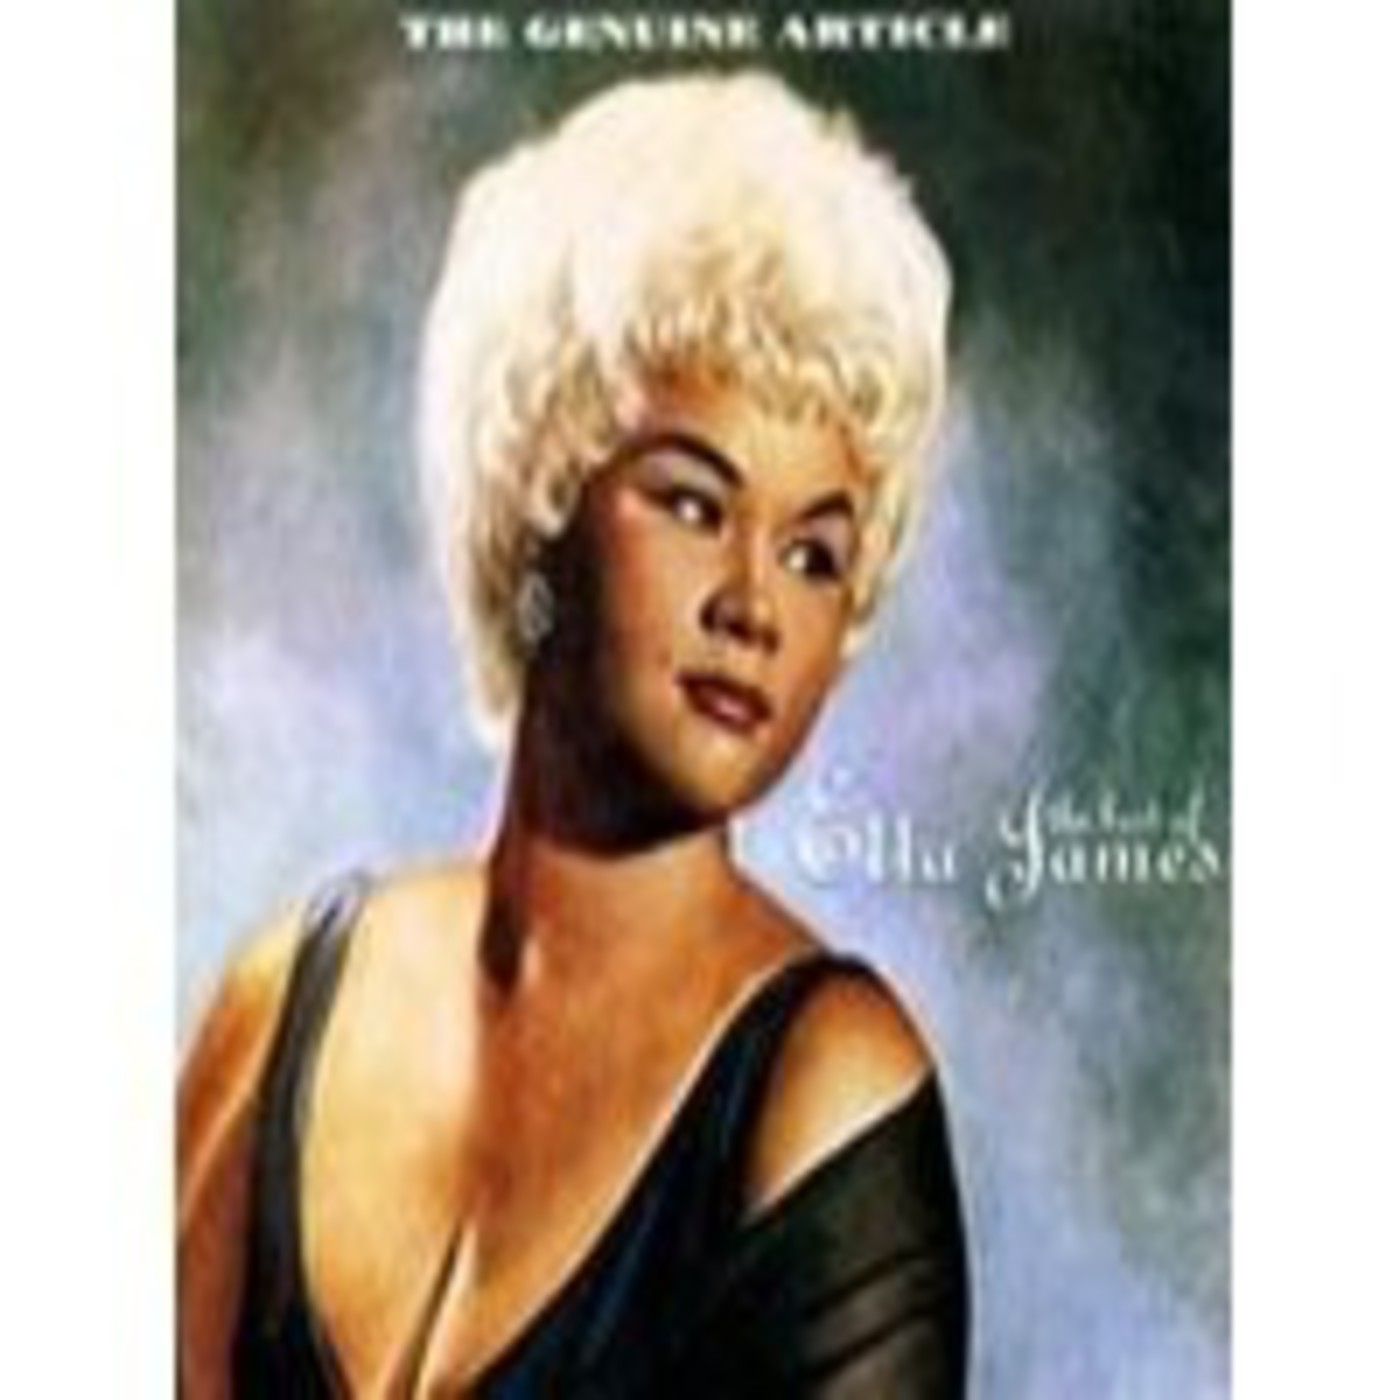 Sonidos de Ébano 2x03 - Homenaje a Etta James. Popurrí musical: Reggae,Soul,Plena,Latin Jazz, Swing.